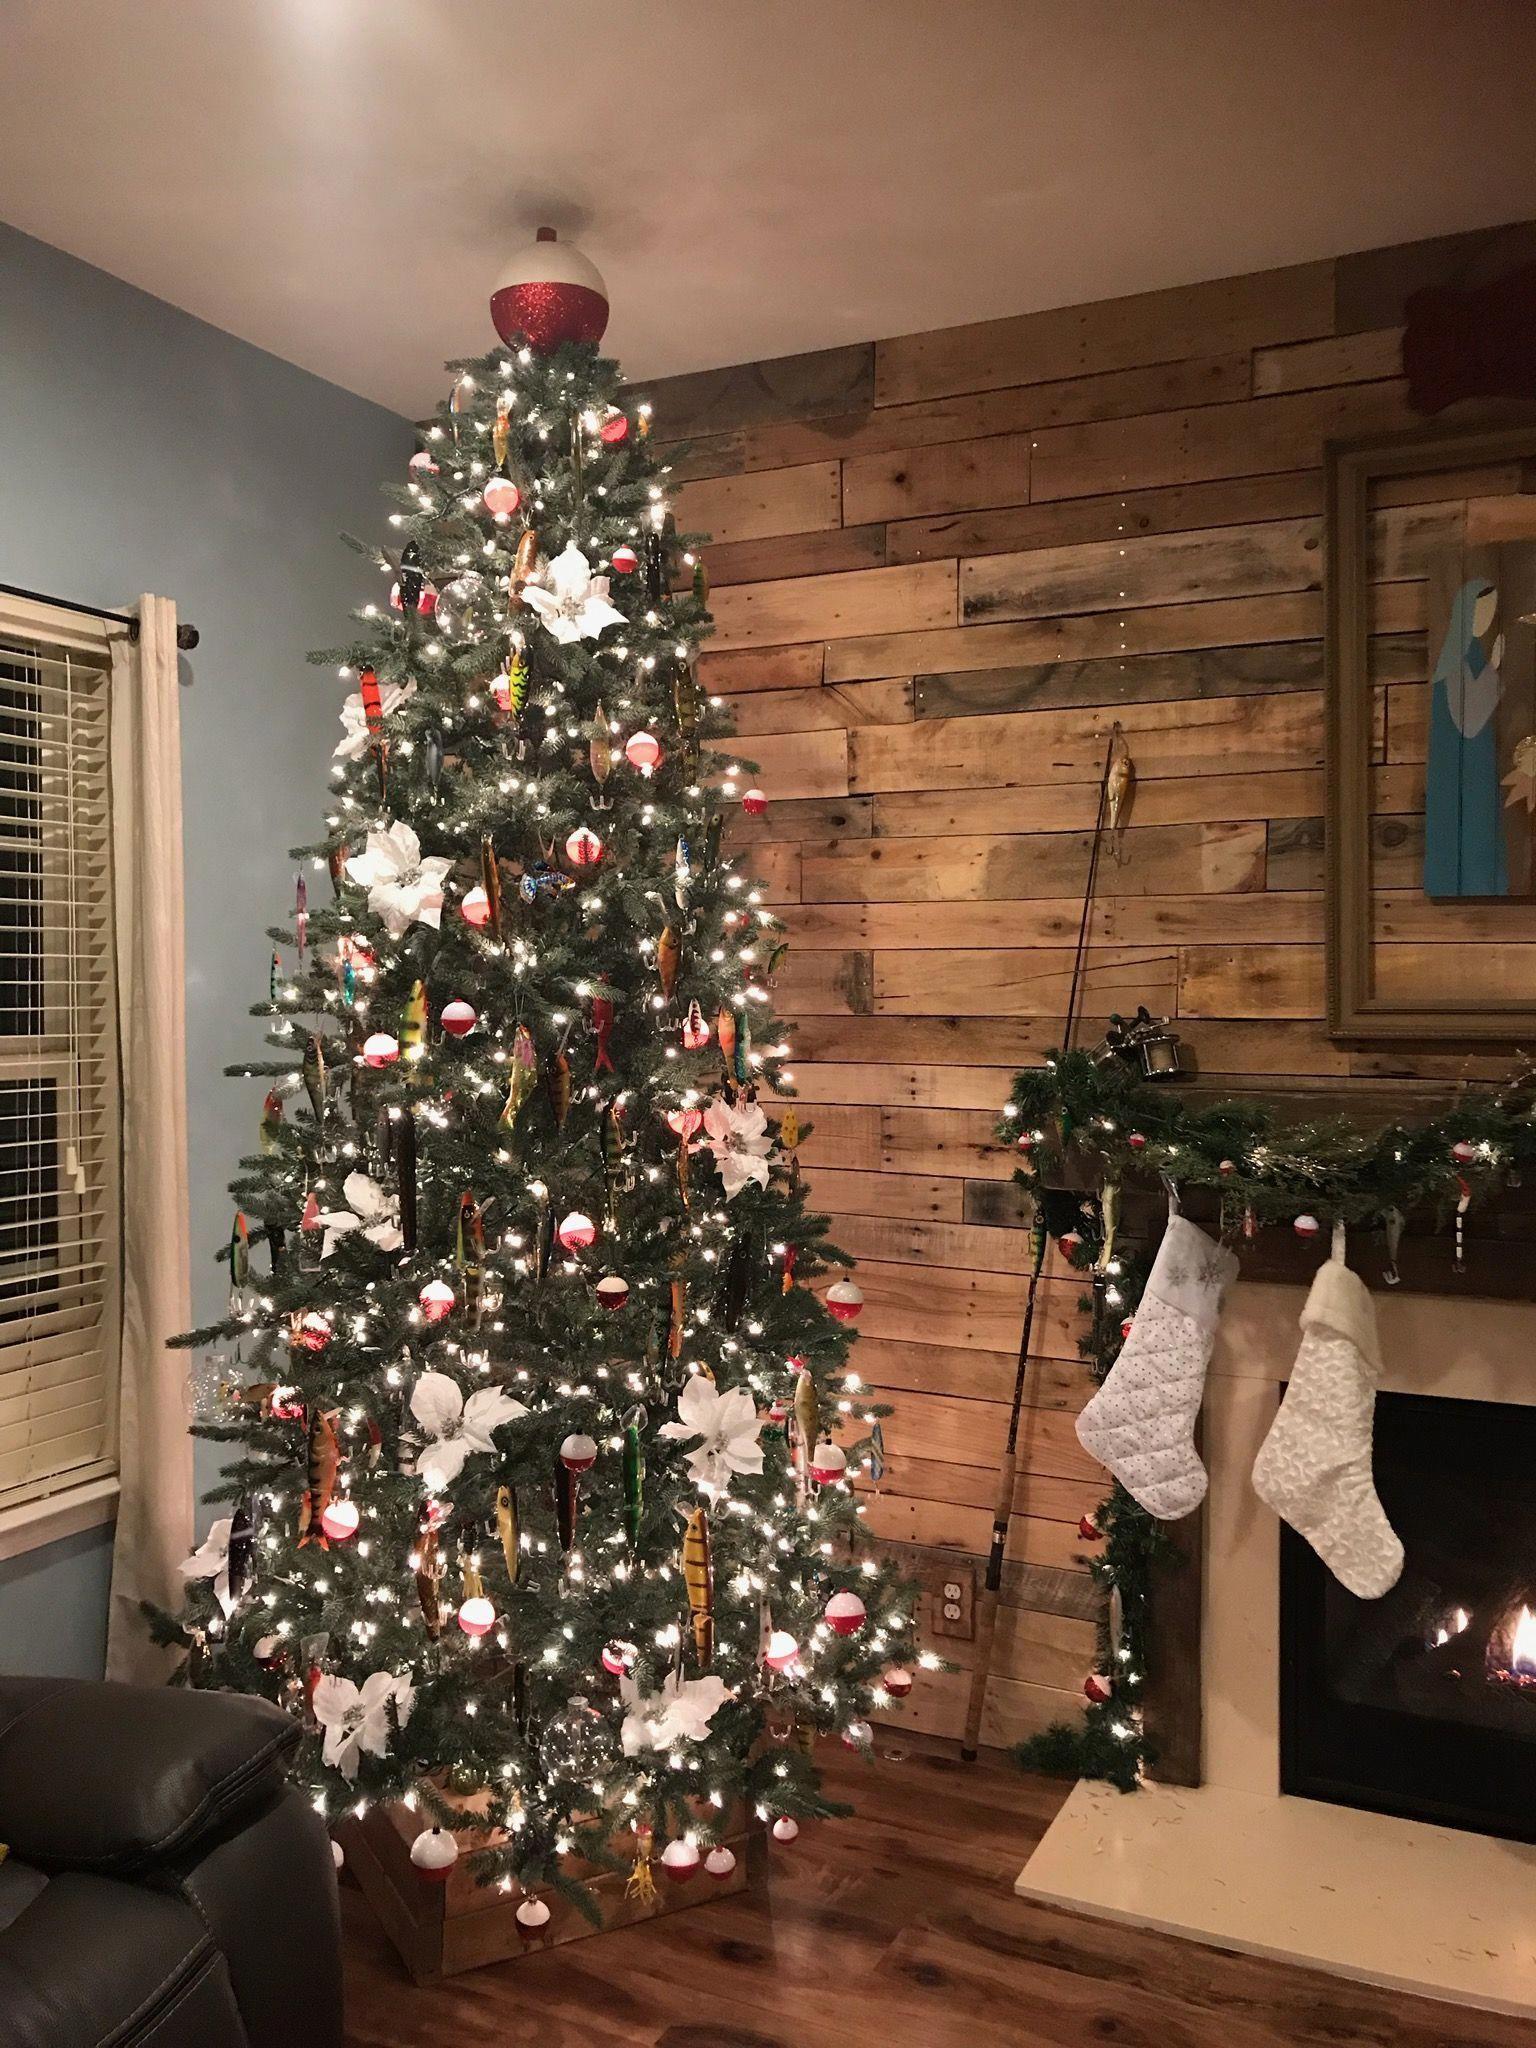 Lure ornaments